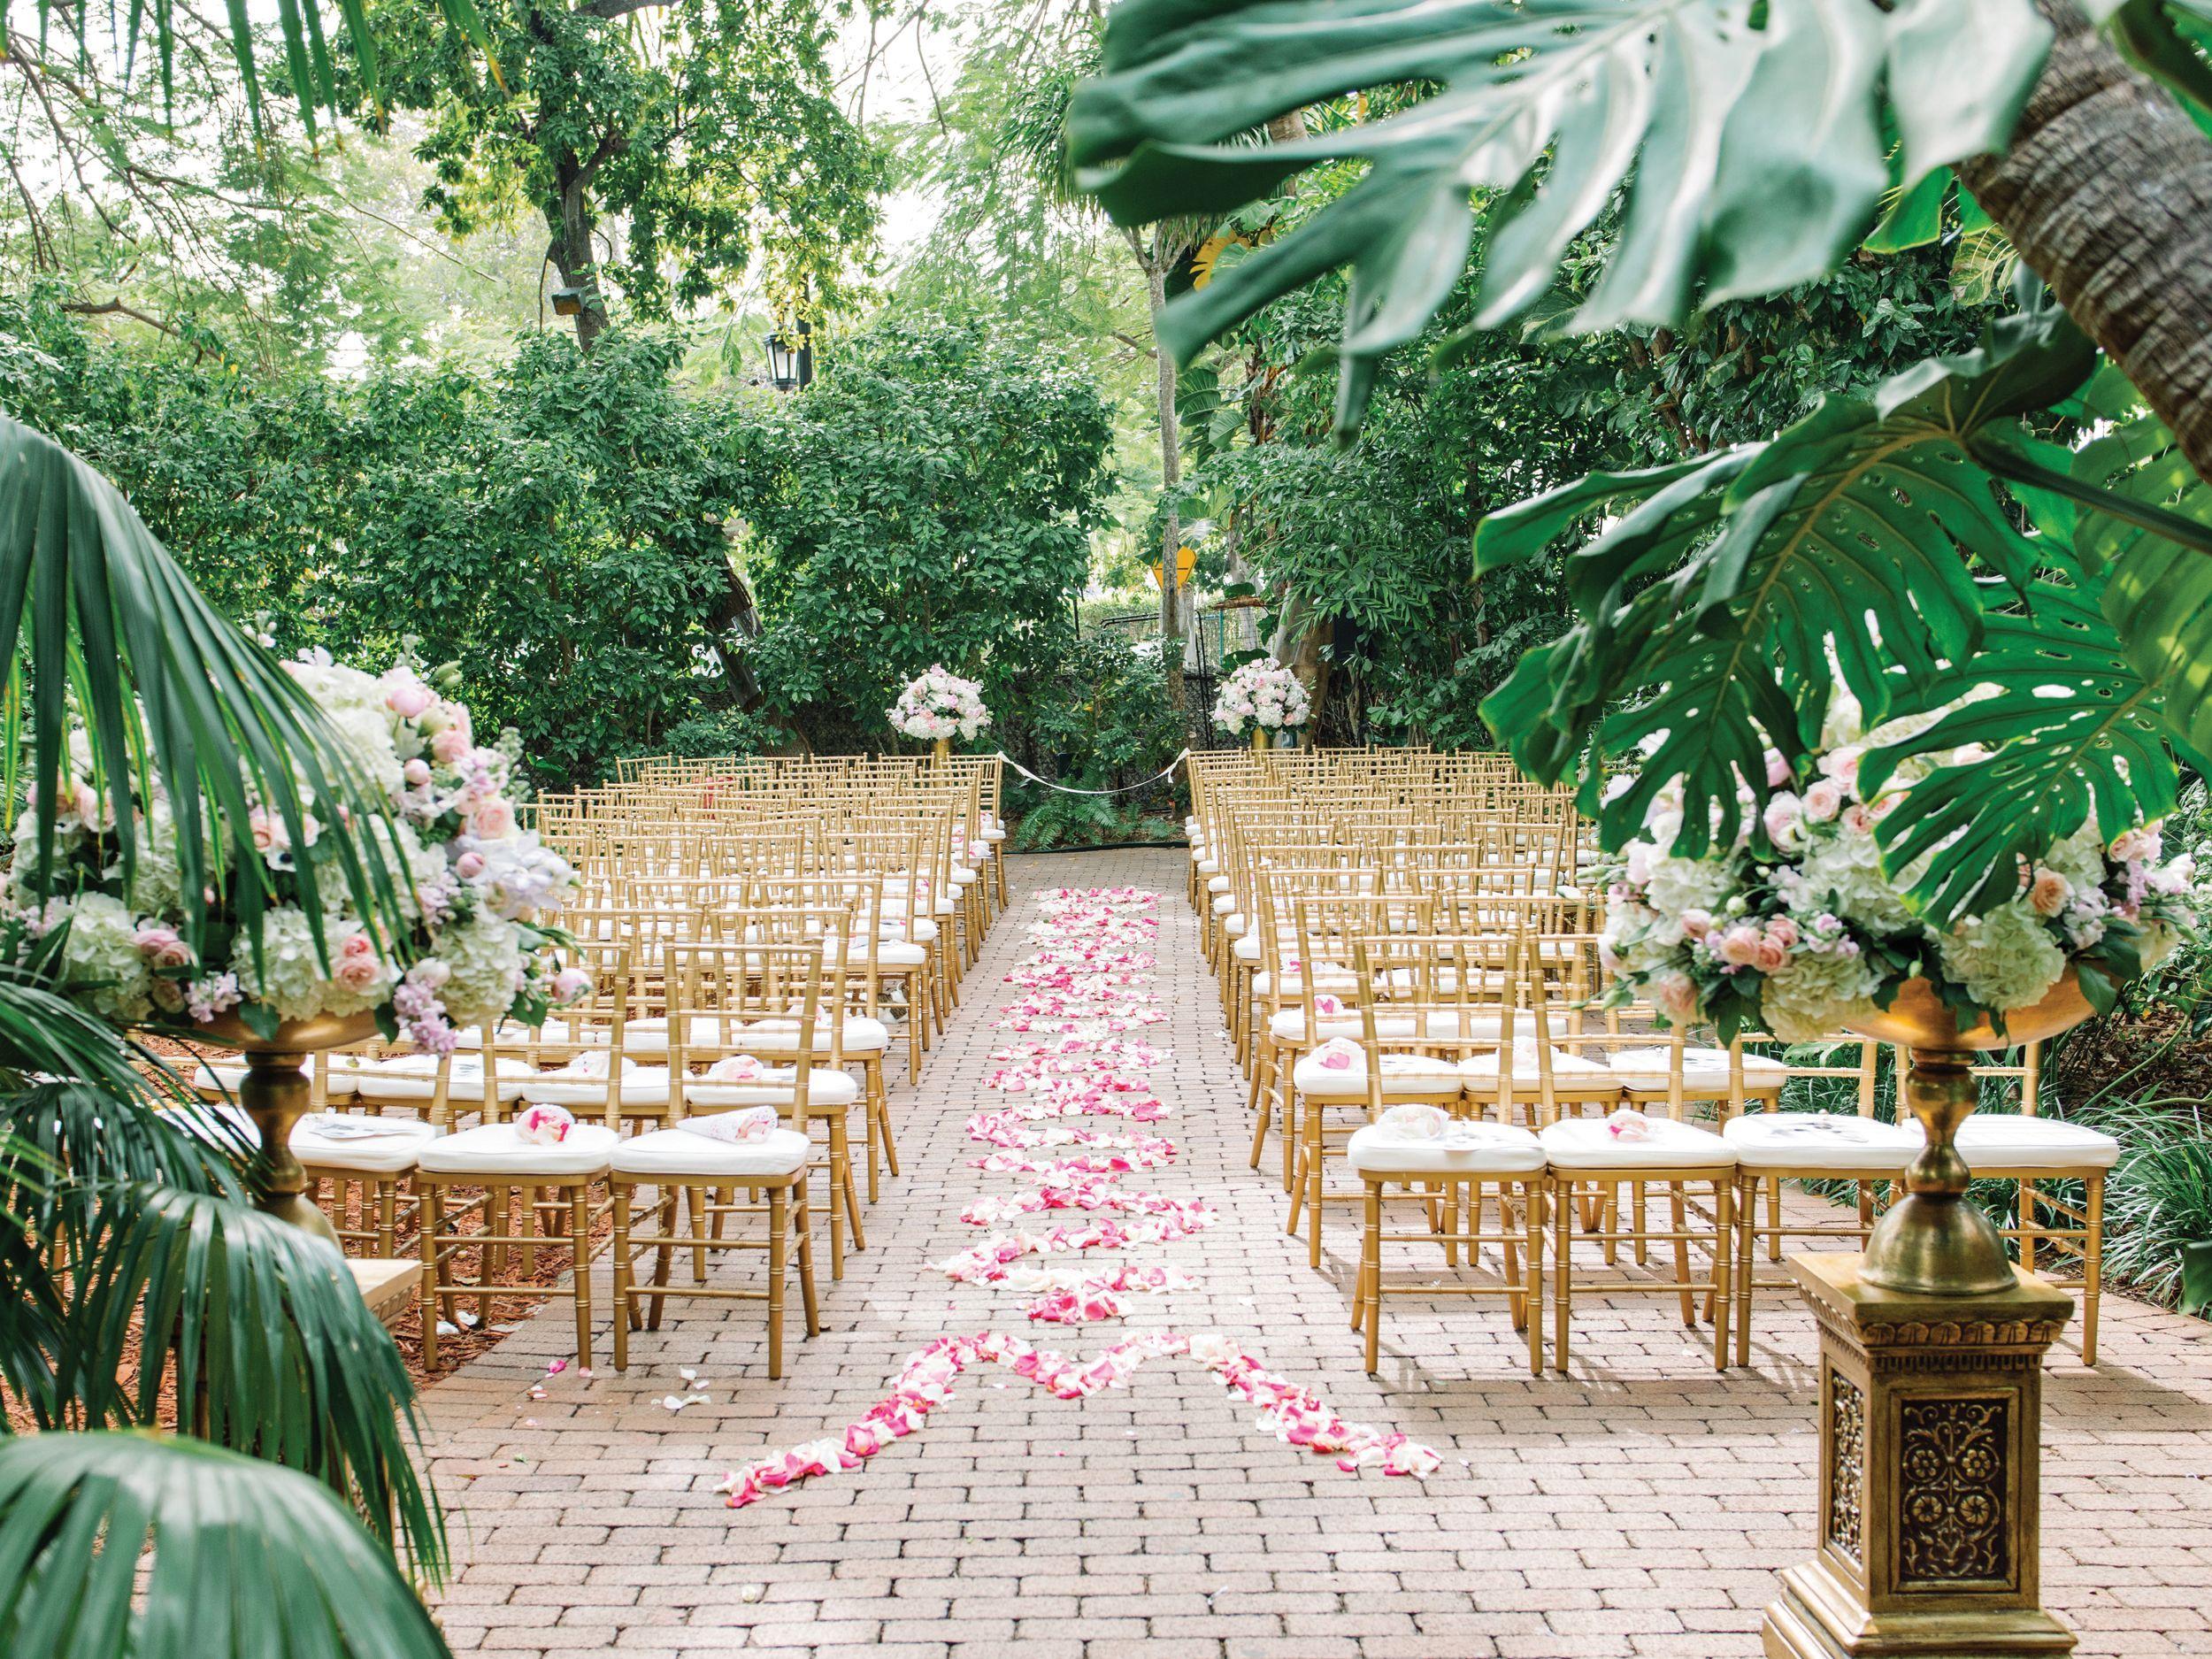 7 Creative Ways To Decorate Your Wedding Ceremony Aisle